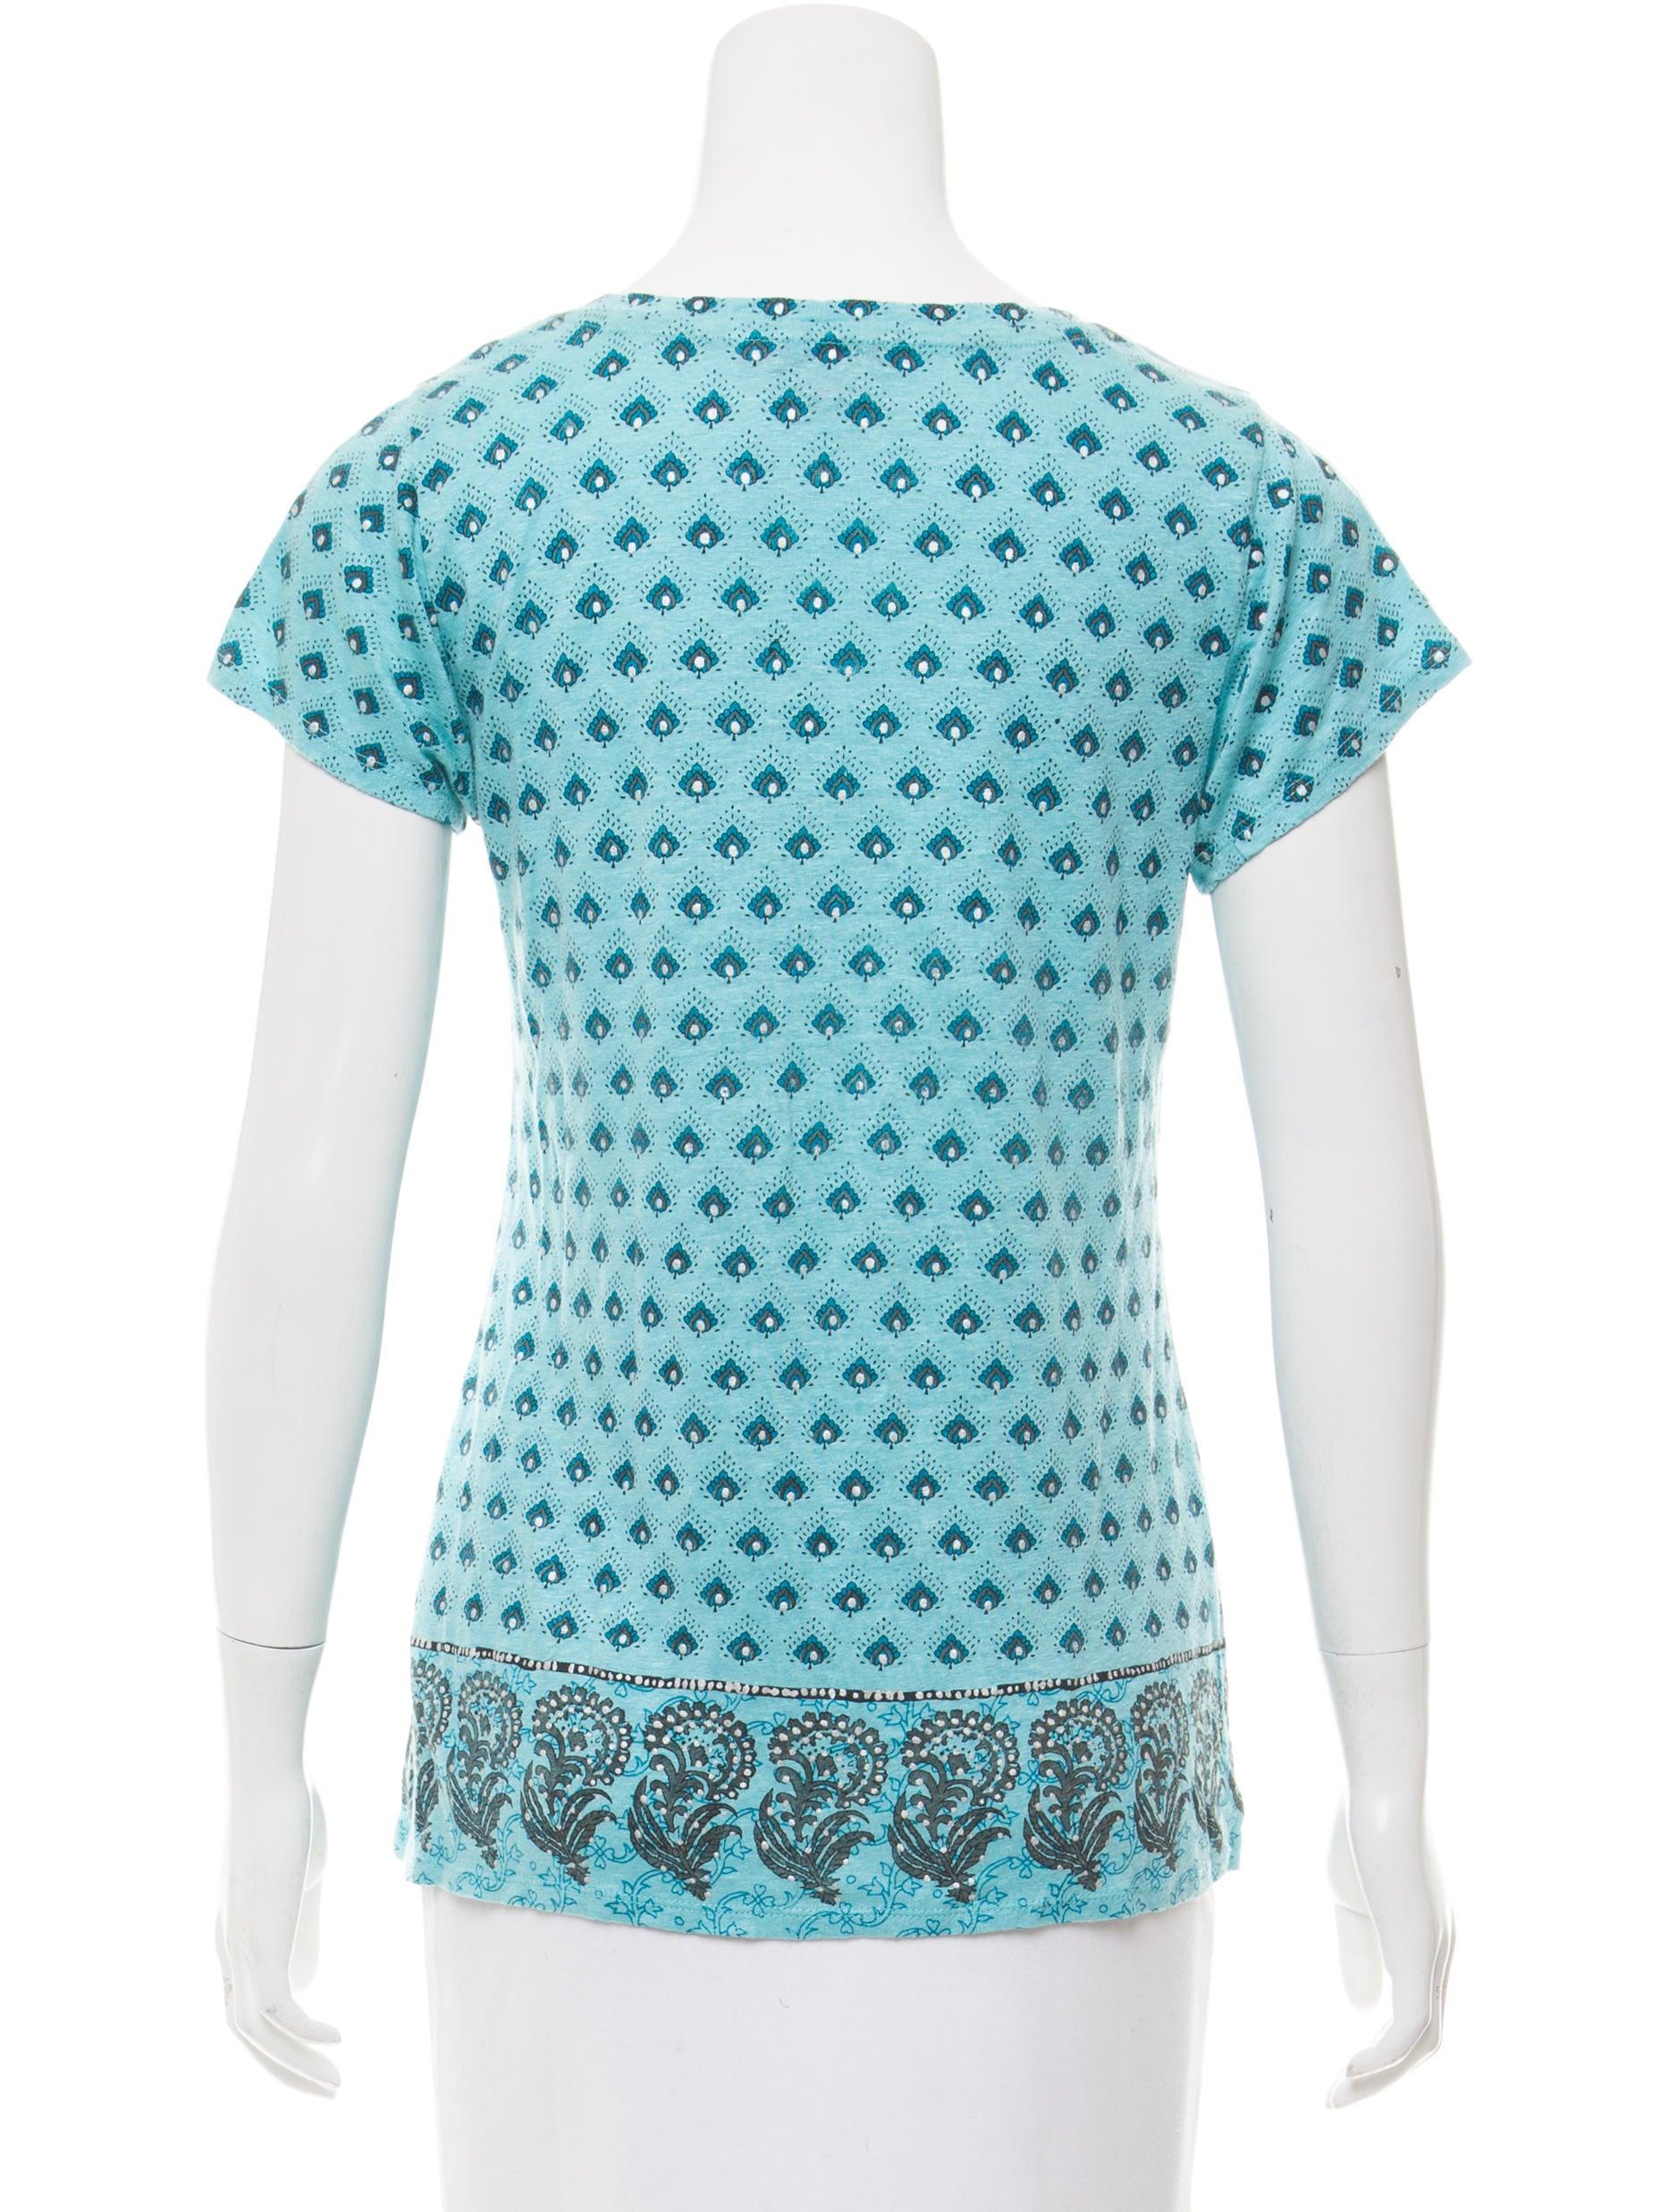 Calypso Printed Short Sleeve T Shirt Clothing Wc820638